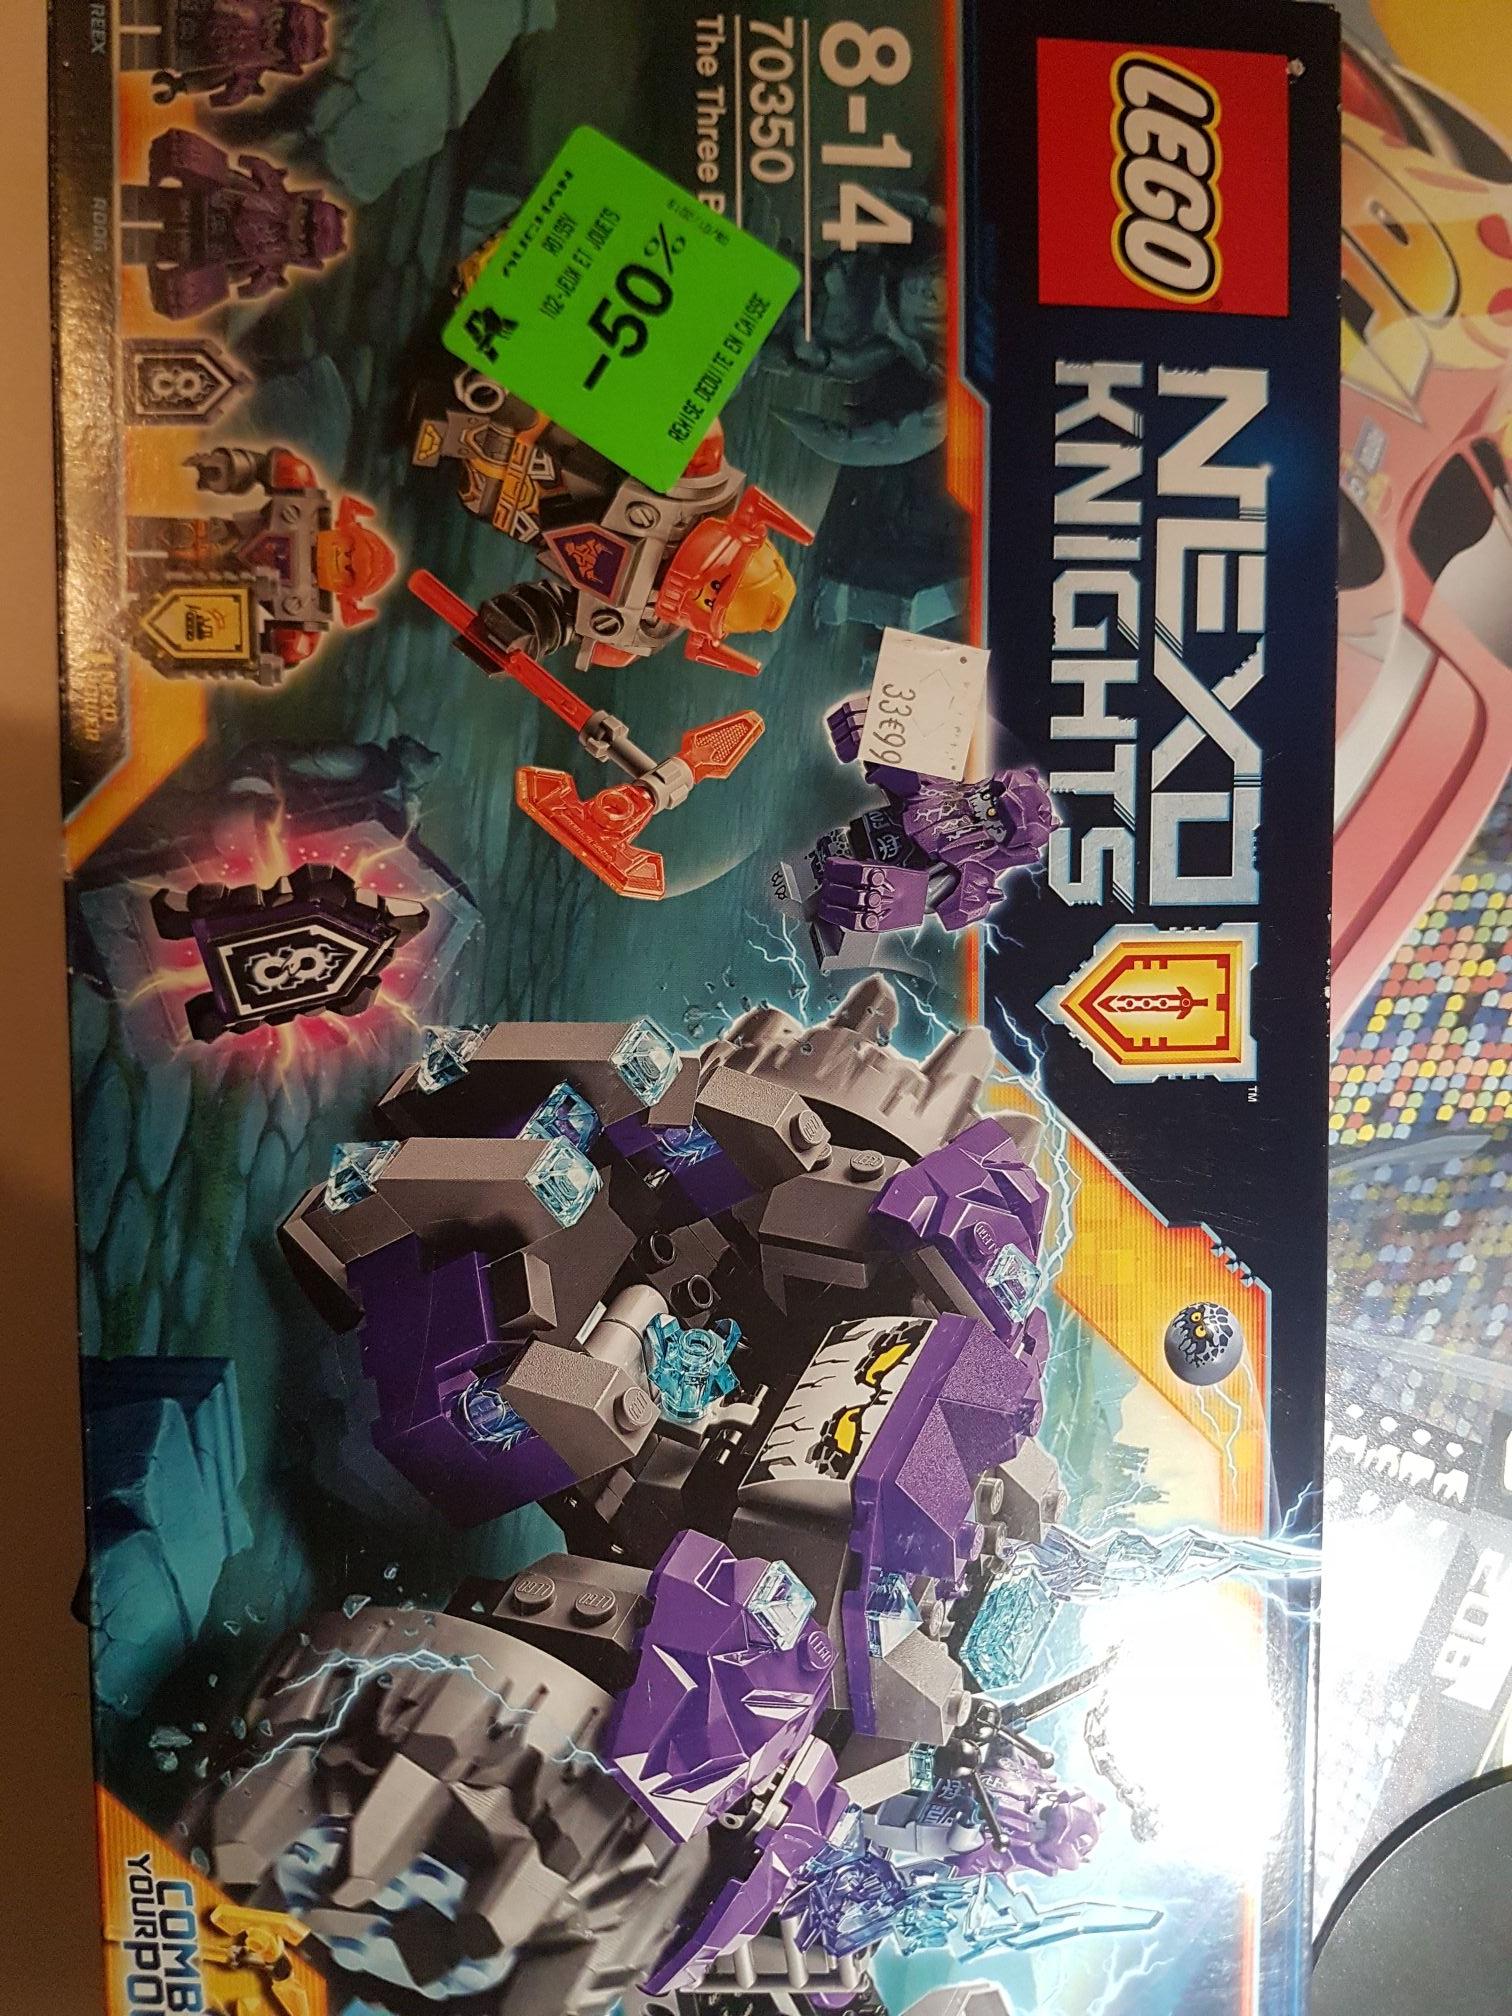 Jeu Lego Nexo Knights - The Three Brothers (70350) au Auchan Roissy-en-France (95)